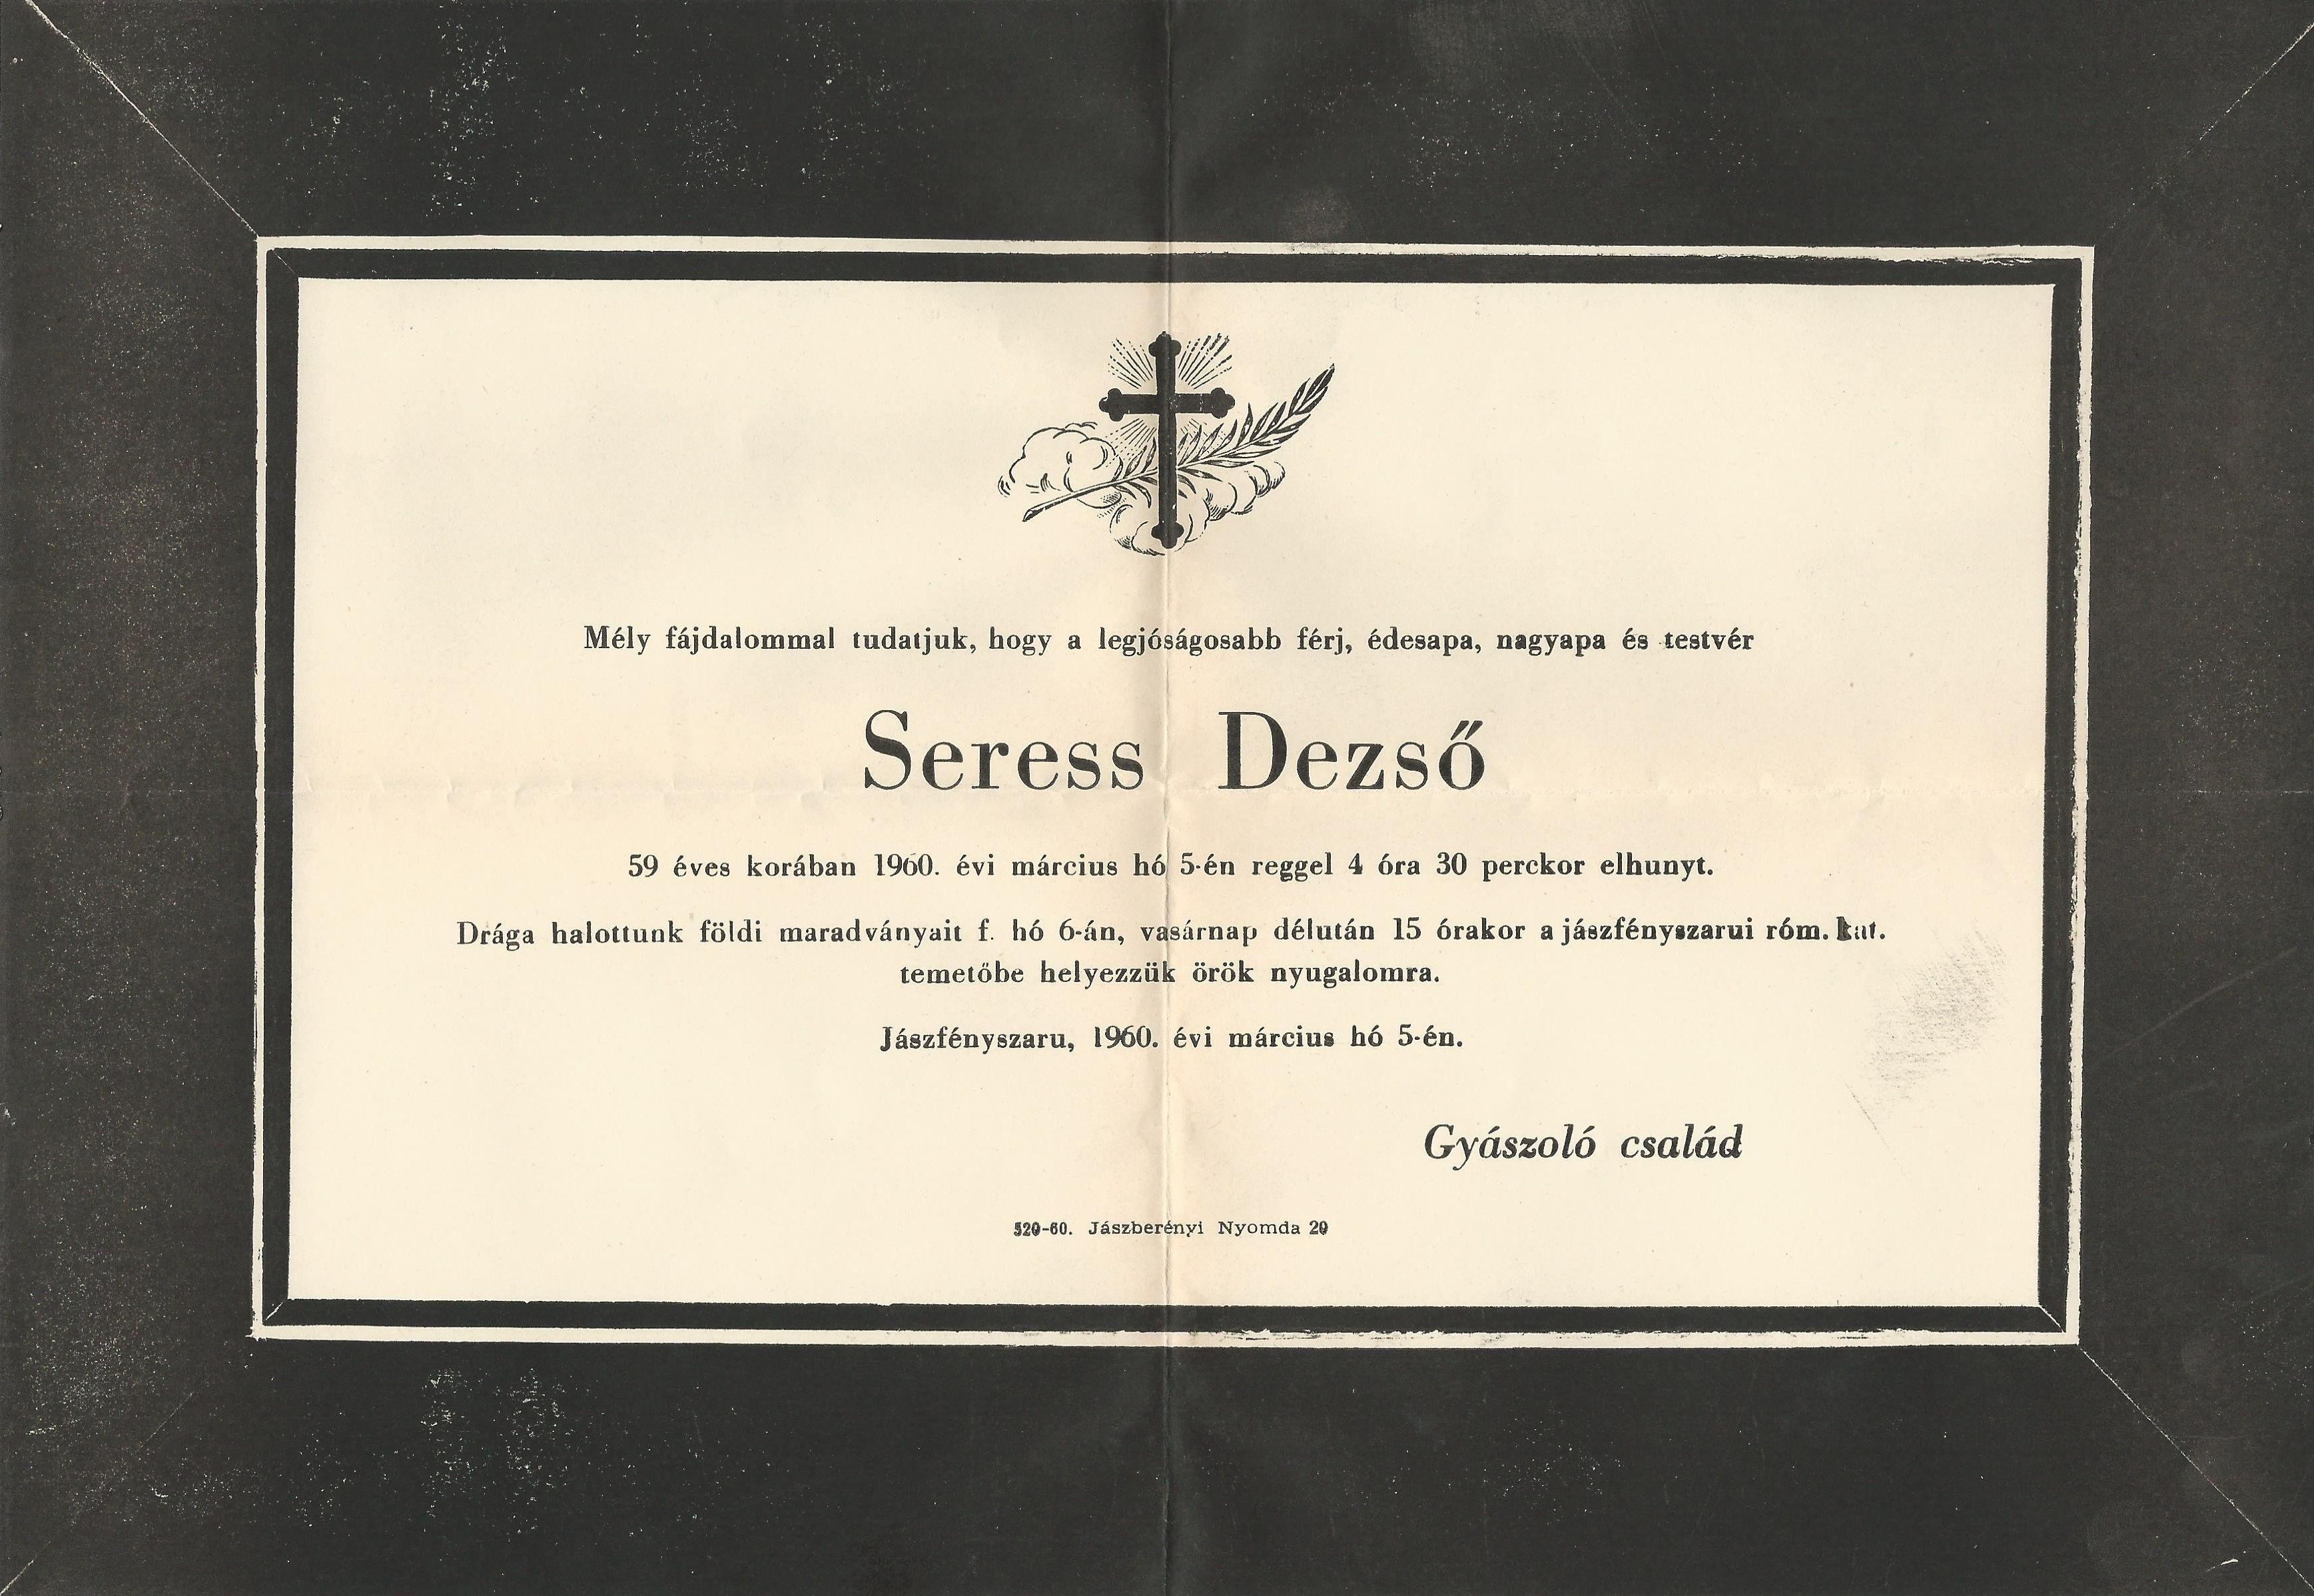 Seress Dezső